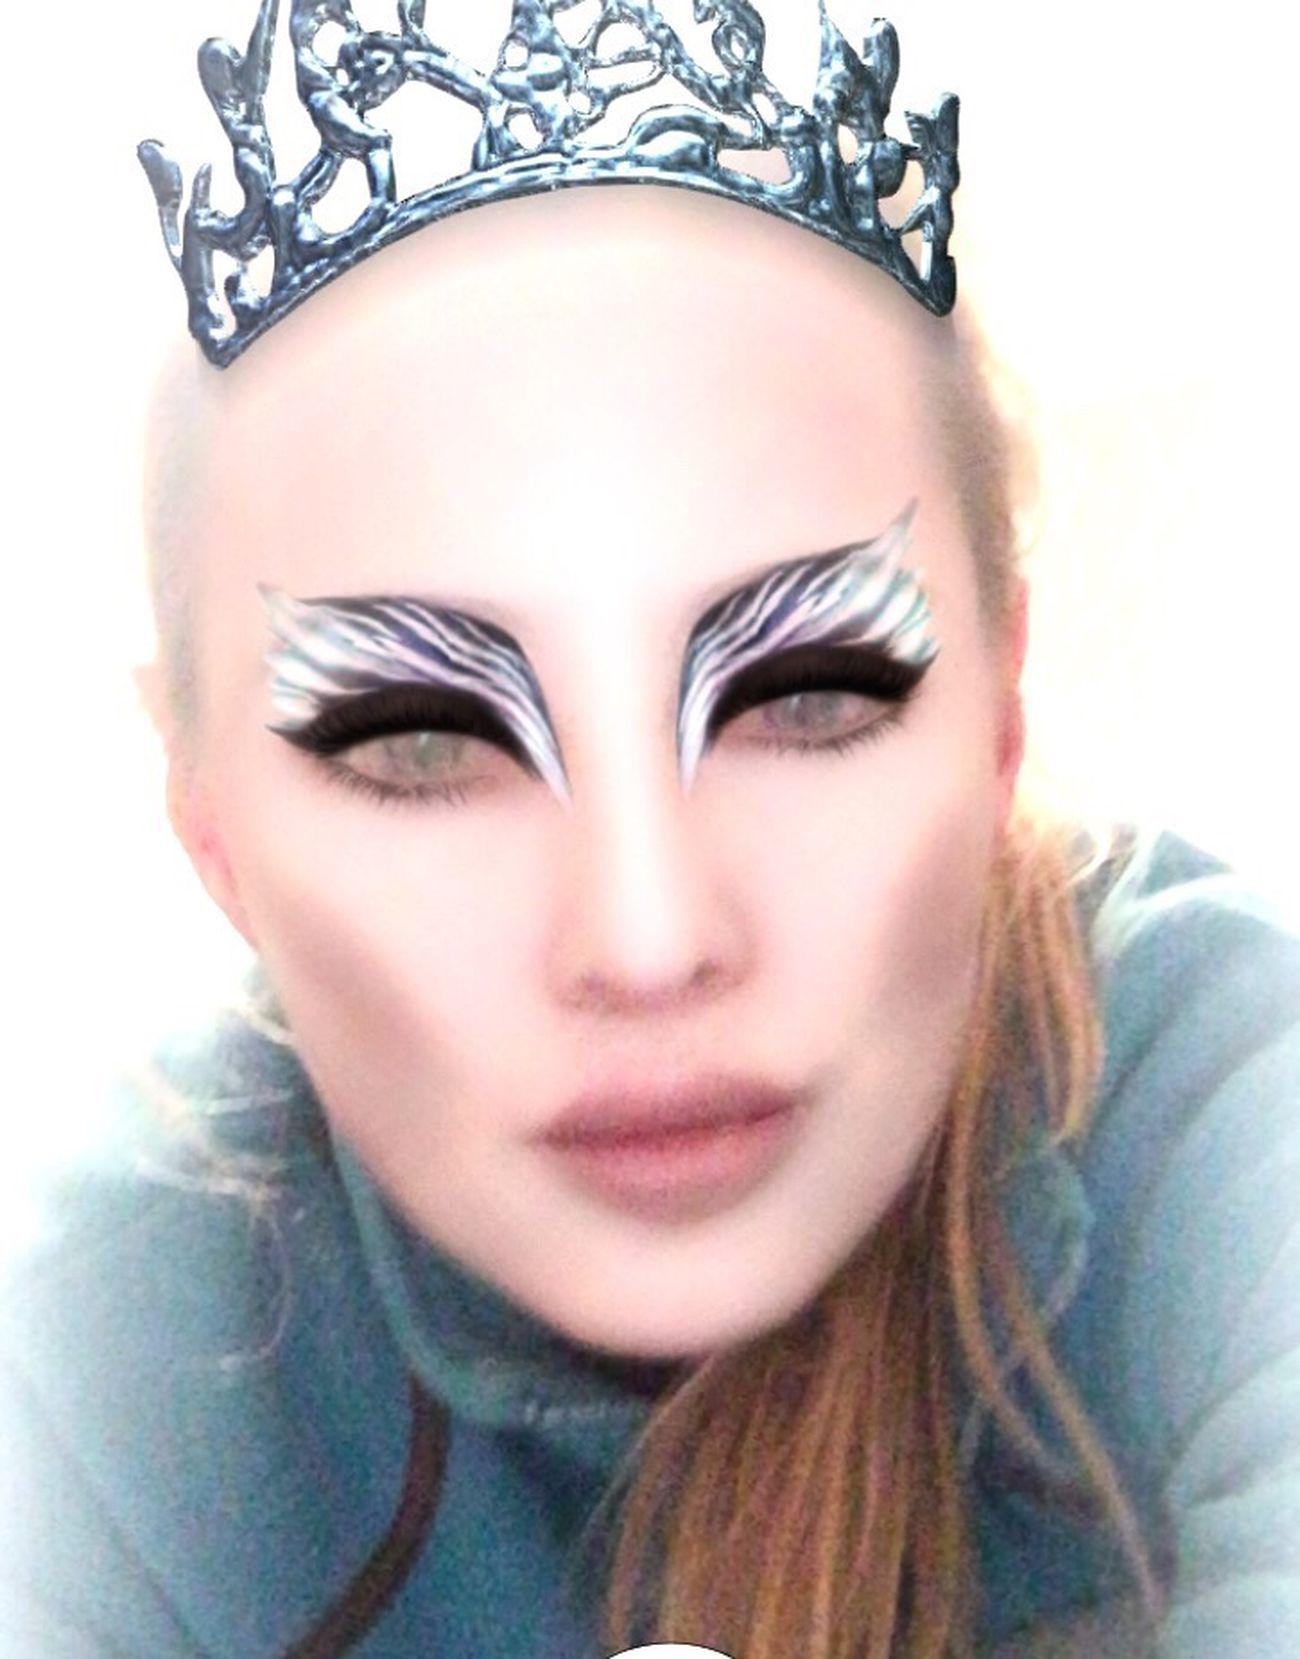 Buzlar kraliçesi Melike Beautiful People Human Face Pictures Istanbul Women Elf Venezia